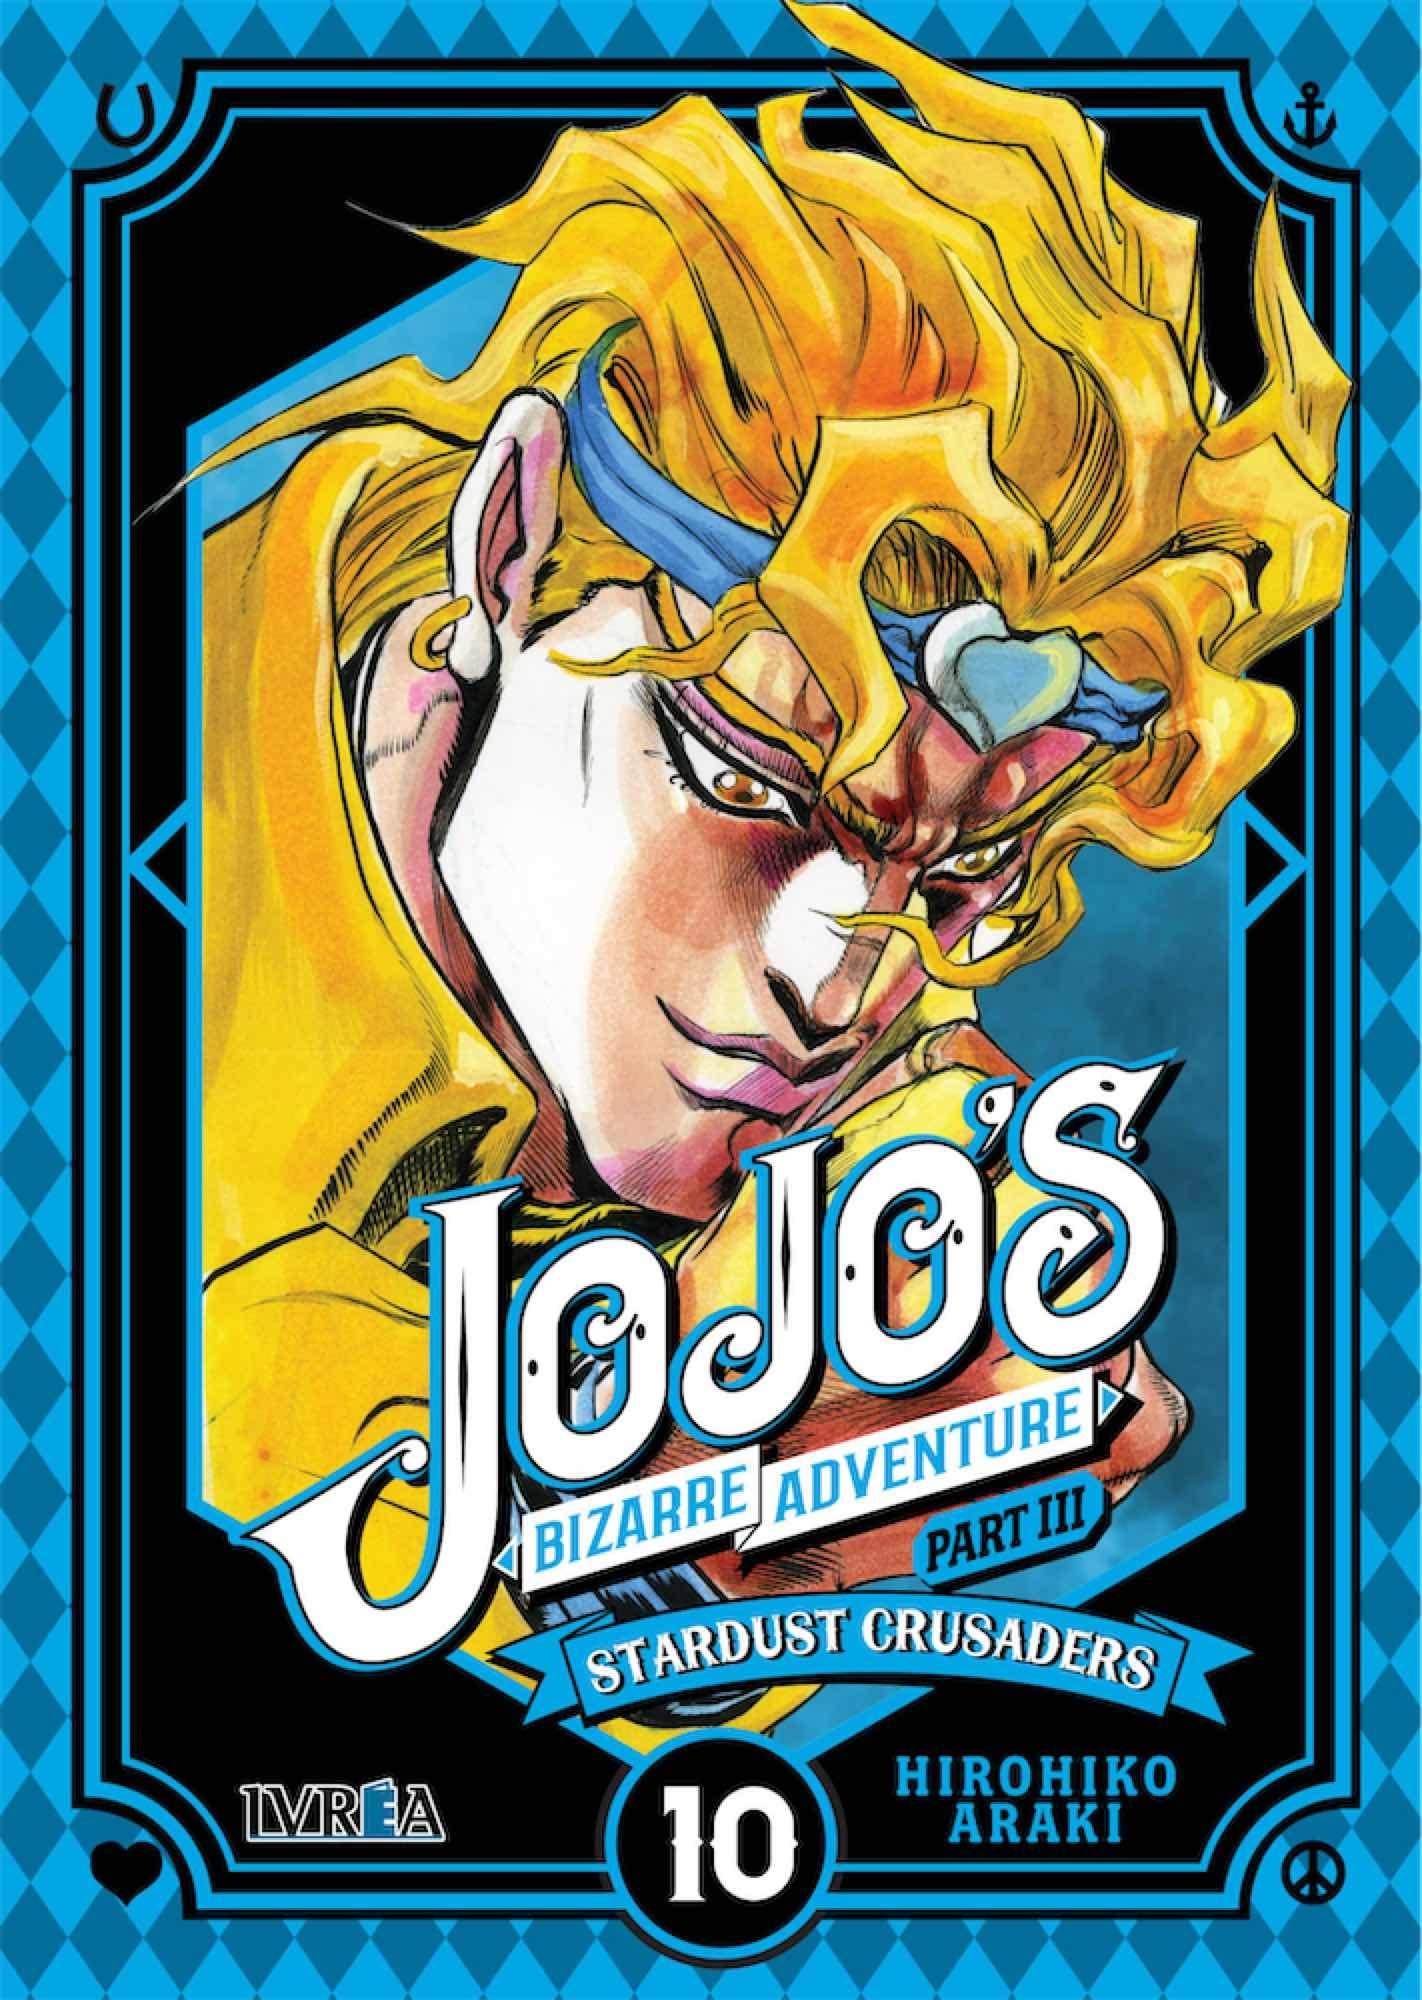 Jojos Bizarre Adventure 3. Stardust Crusaders 10: Amazon.es: Araki Hirohiko: Libros